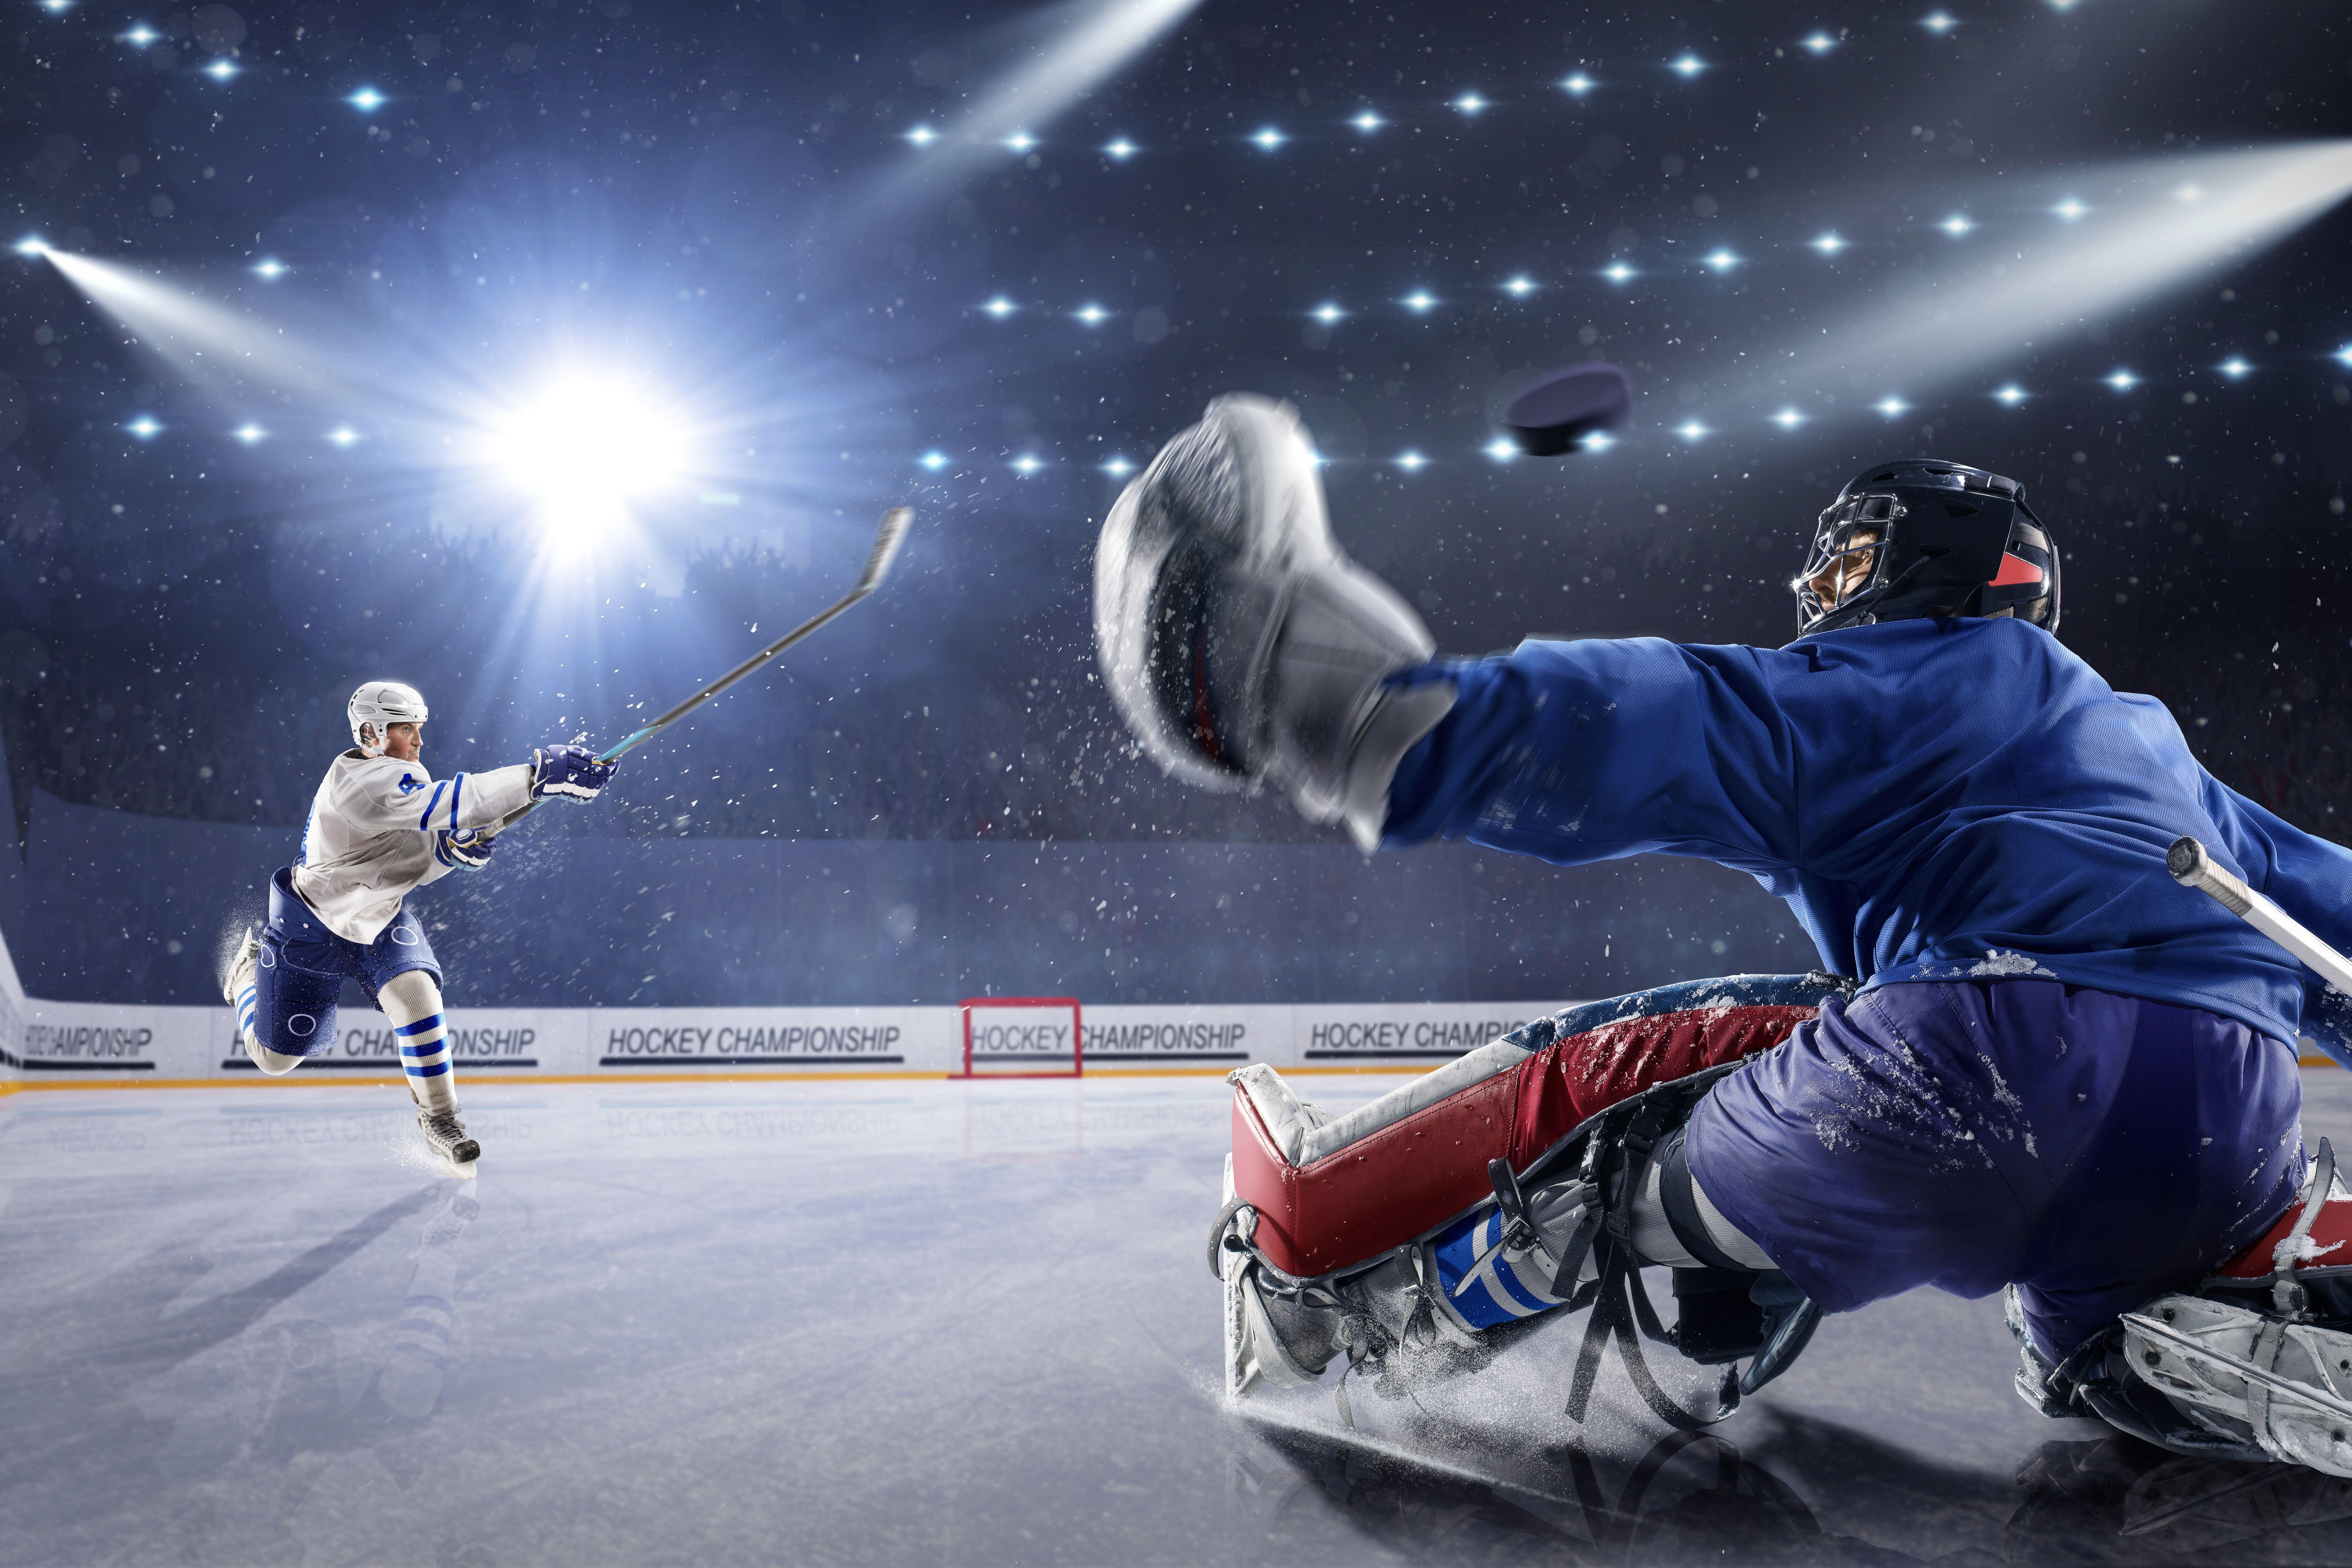 Hockey Ice Light Sports 8k Wallpaper Hdwallpaper Desktop Hockey Players Sports Wallpapers Winter Sports